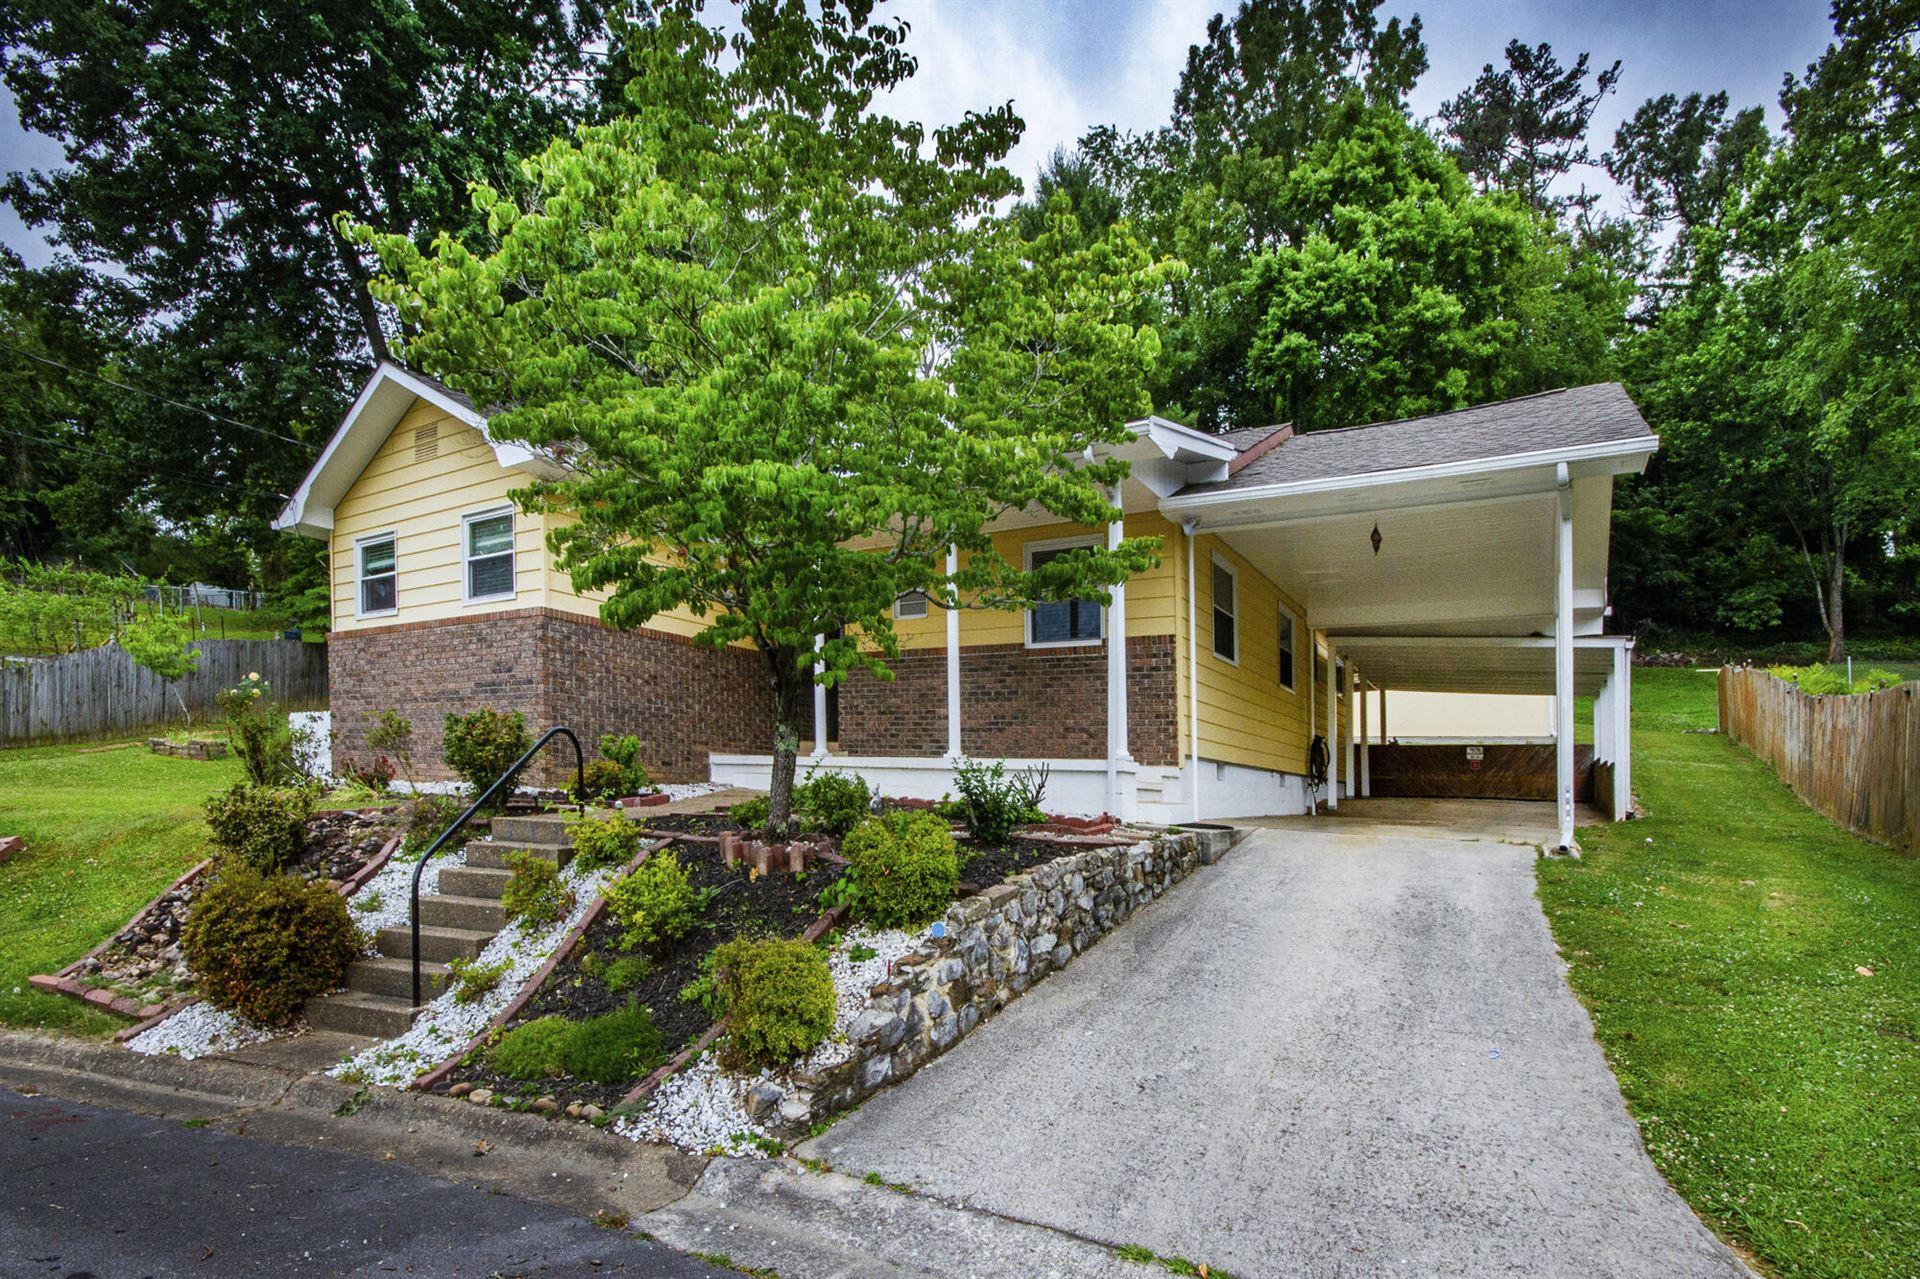 Photo of 113 Tilden Rd, Oak Ridge, TN 37830 (MLS # 1155505)